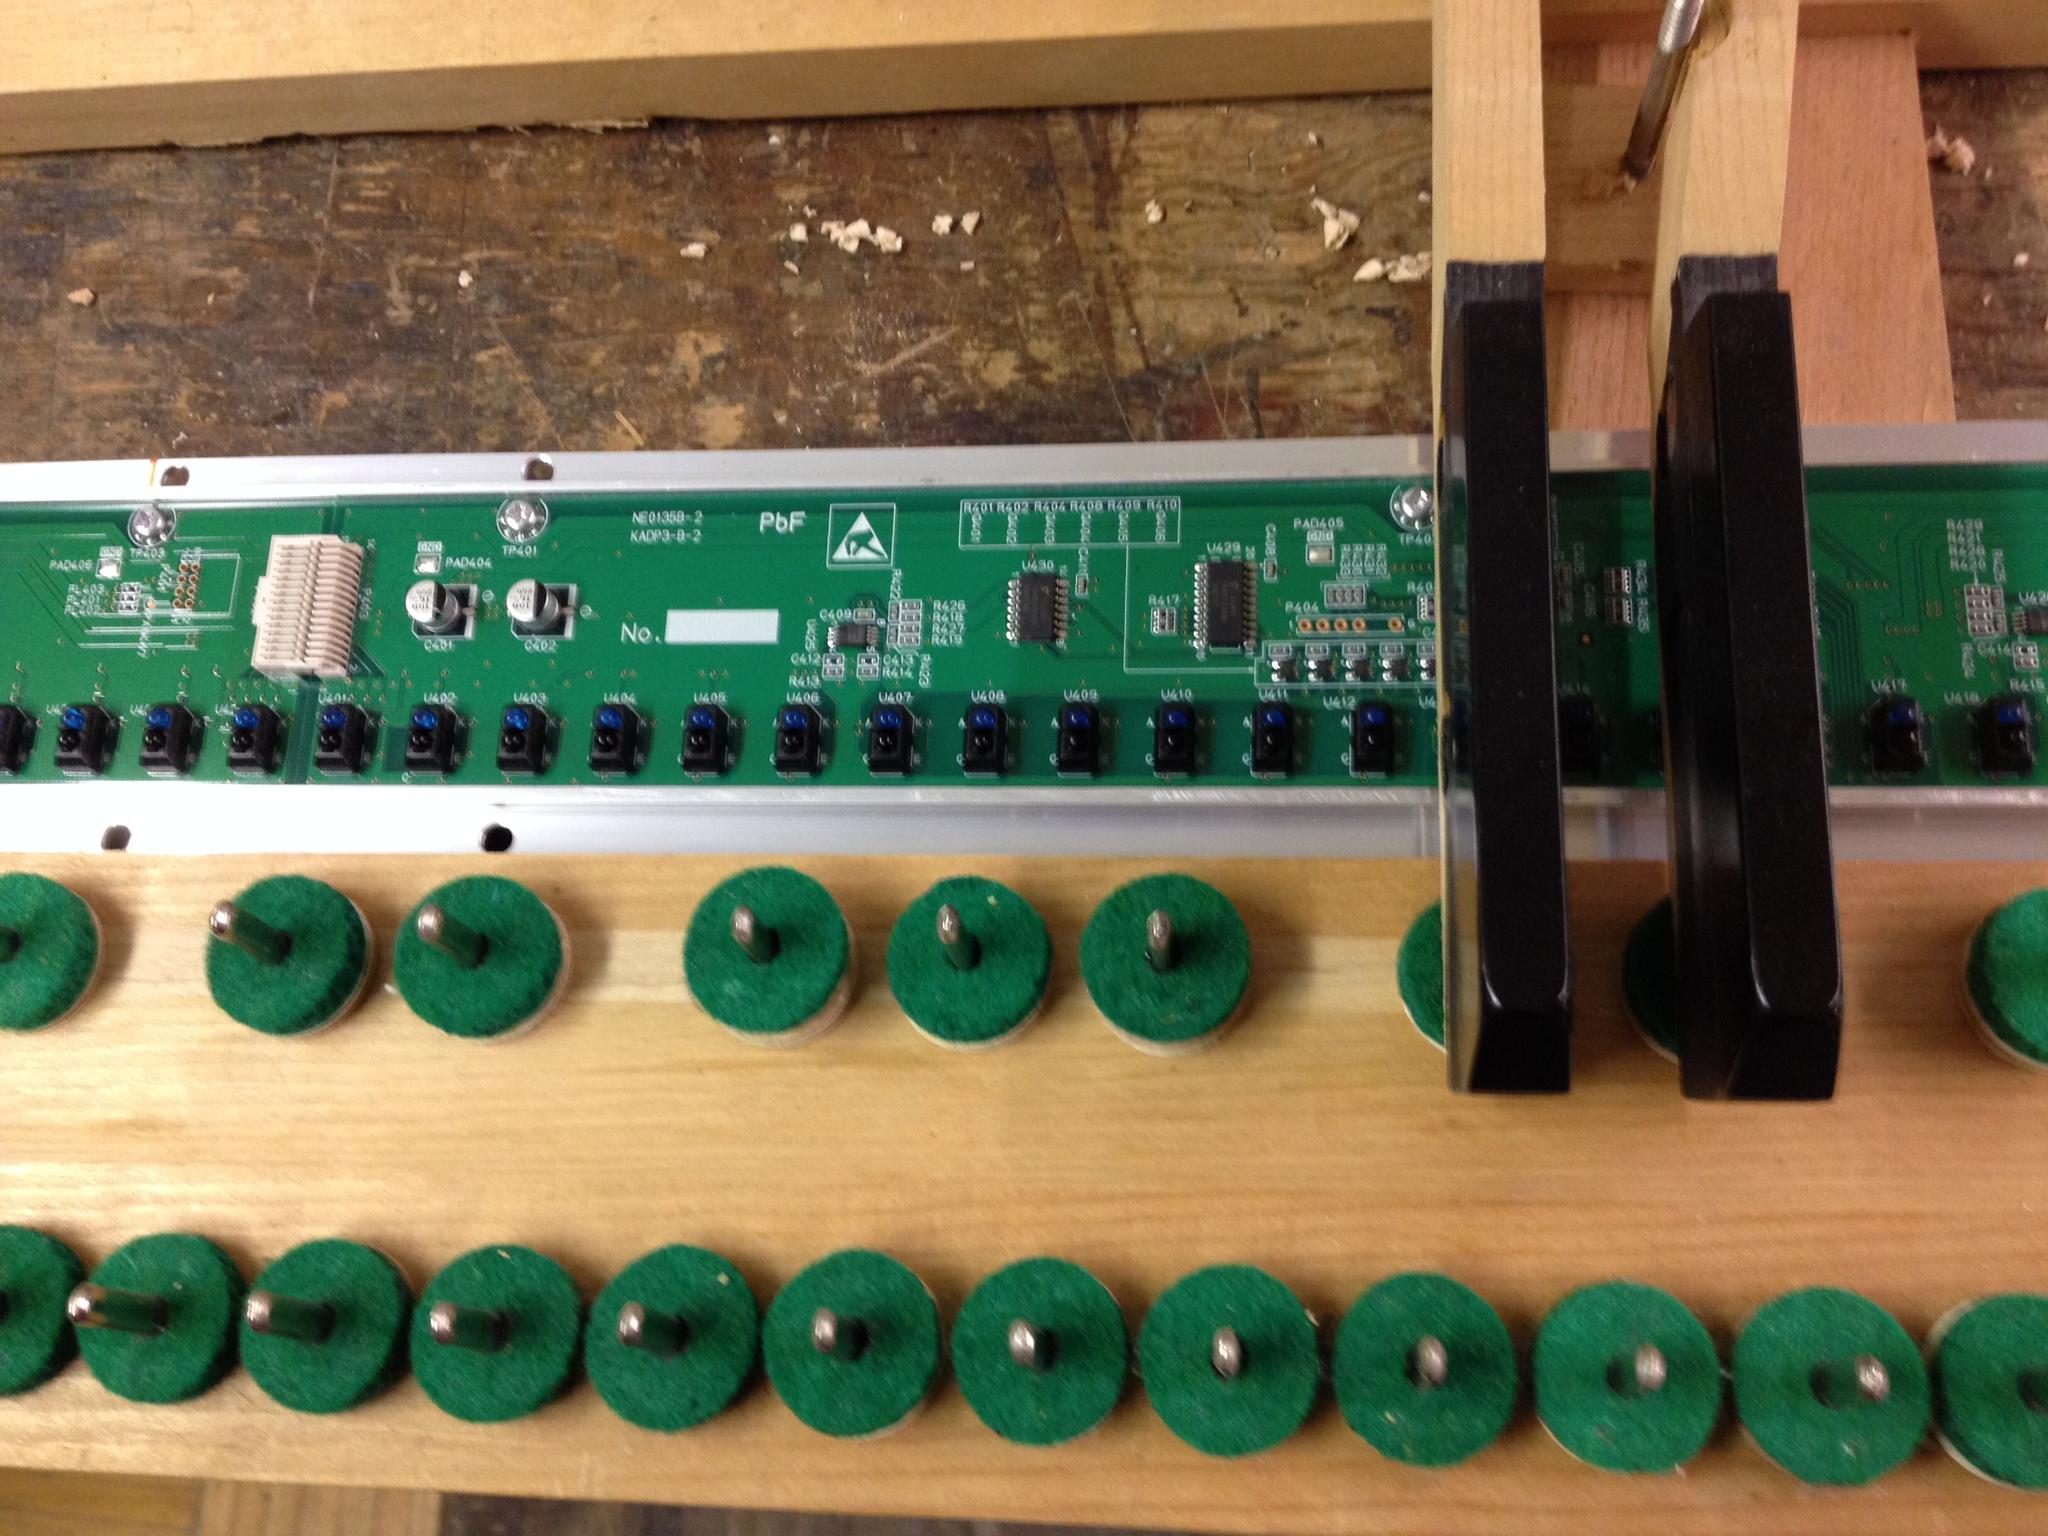 Installing Pianodisc proRecord